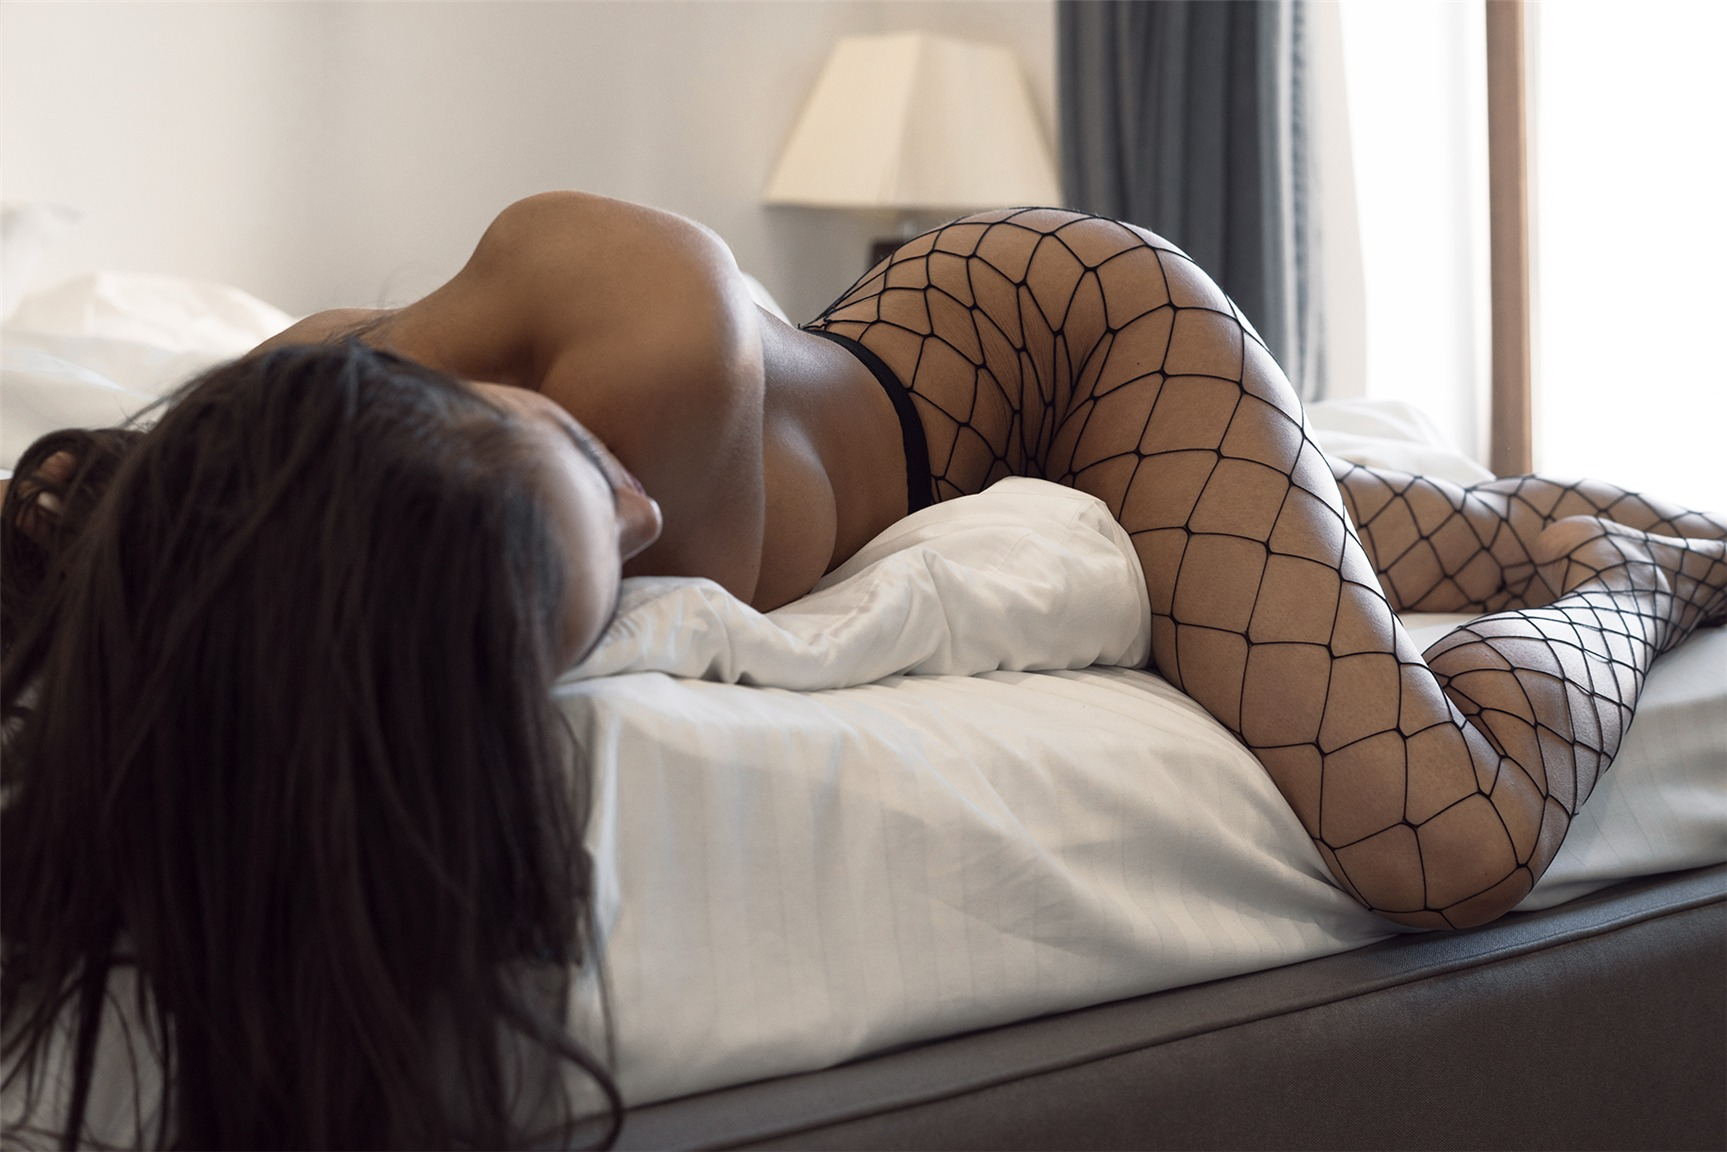 Дебютная эротическая фотосъемка Натали Бонд / Natali Bond naked by Arthur Kaplun